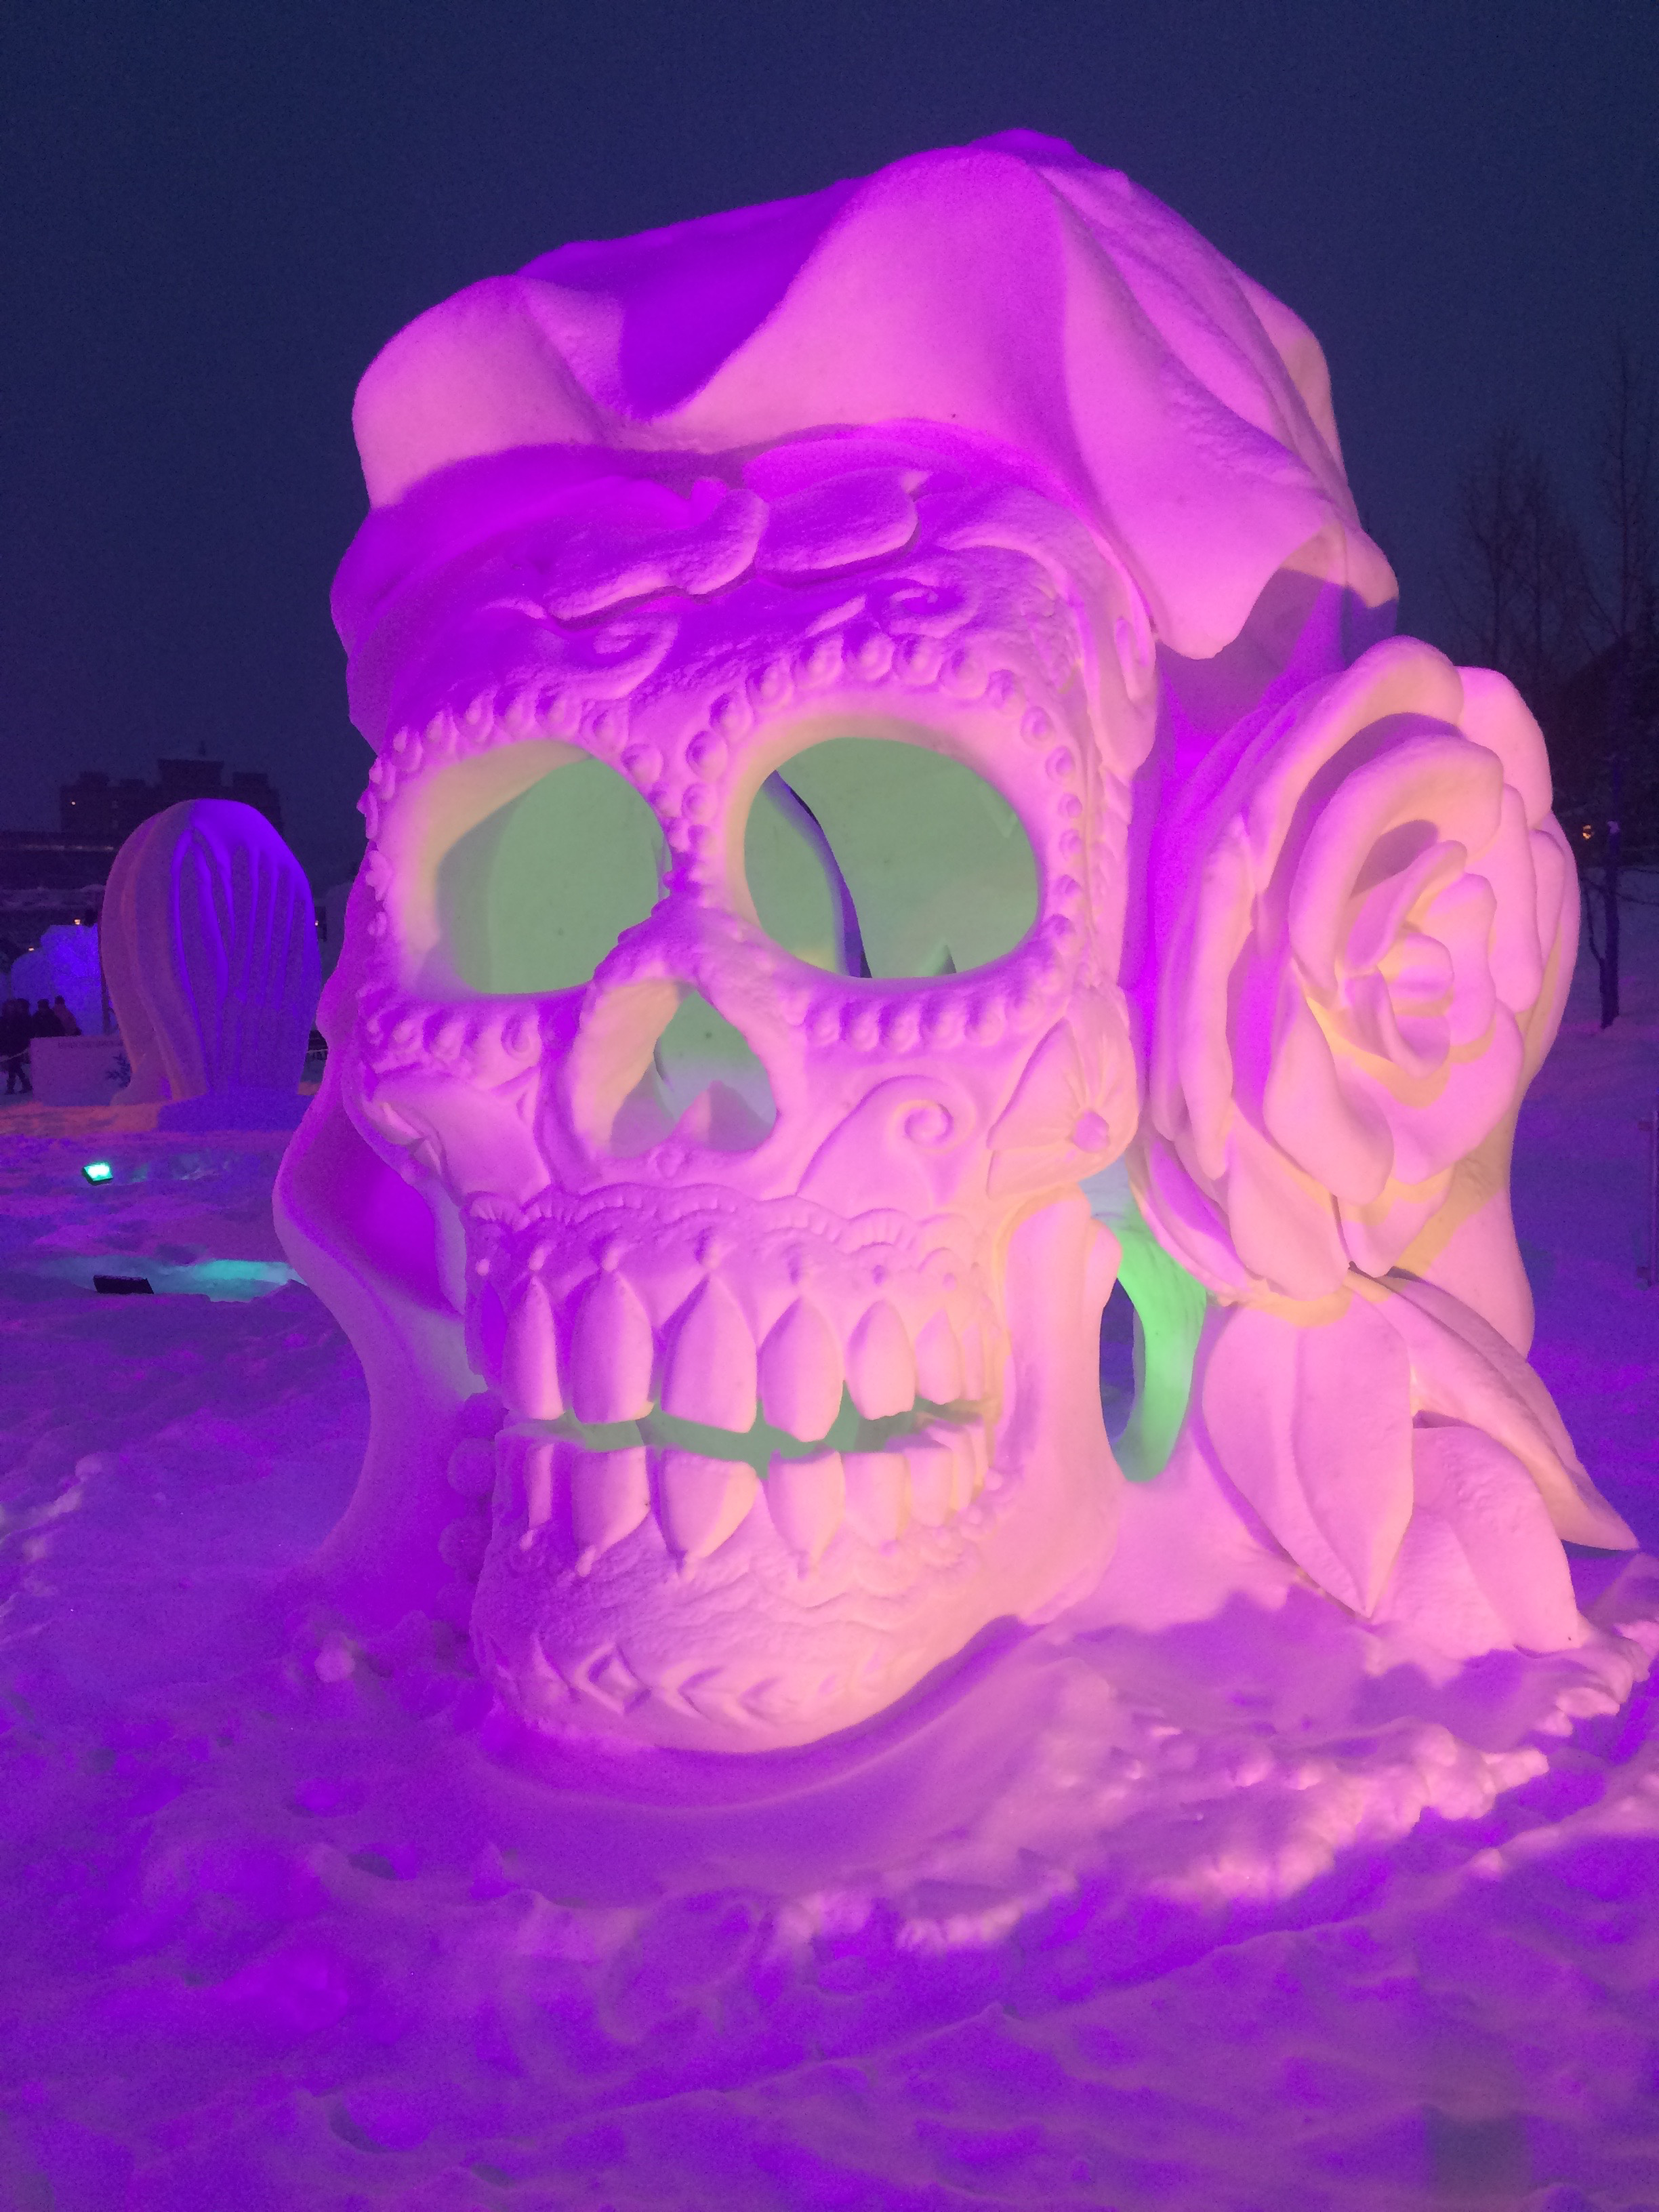 Snow Sculptors Headed To Brekenridge Colorado for International Competition